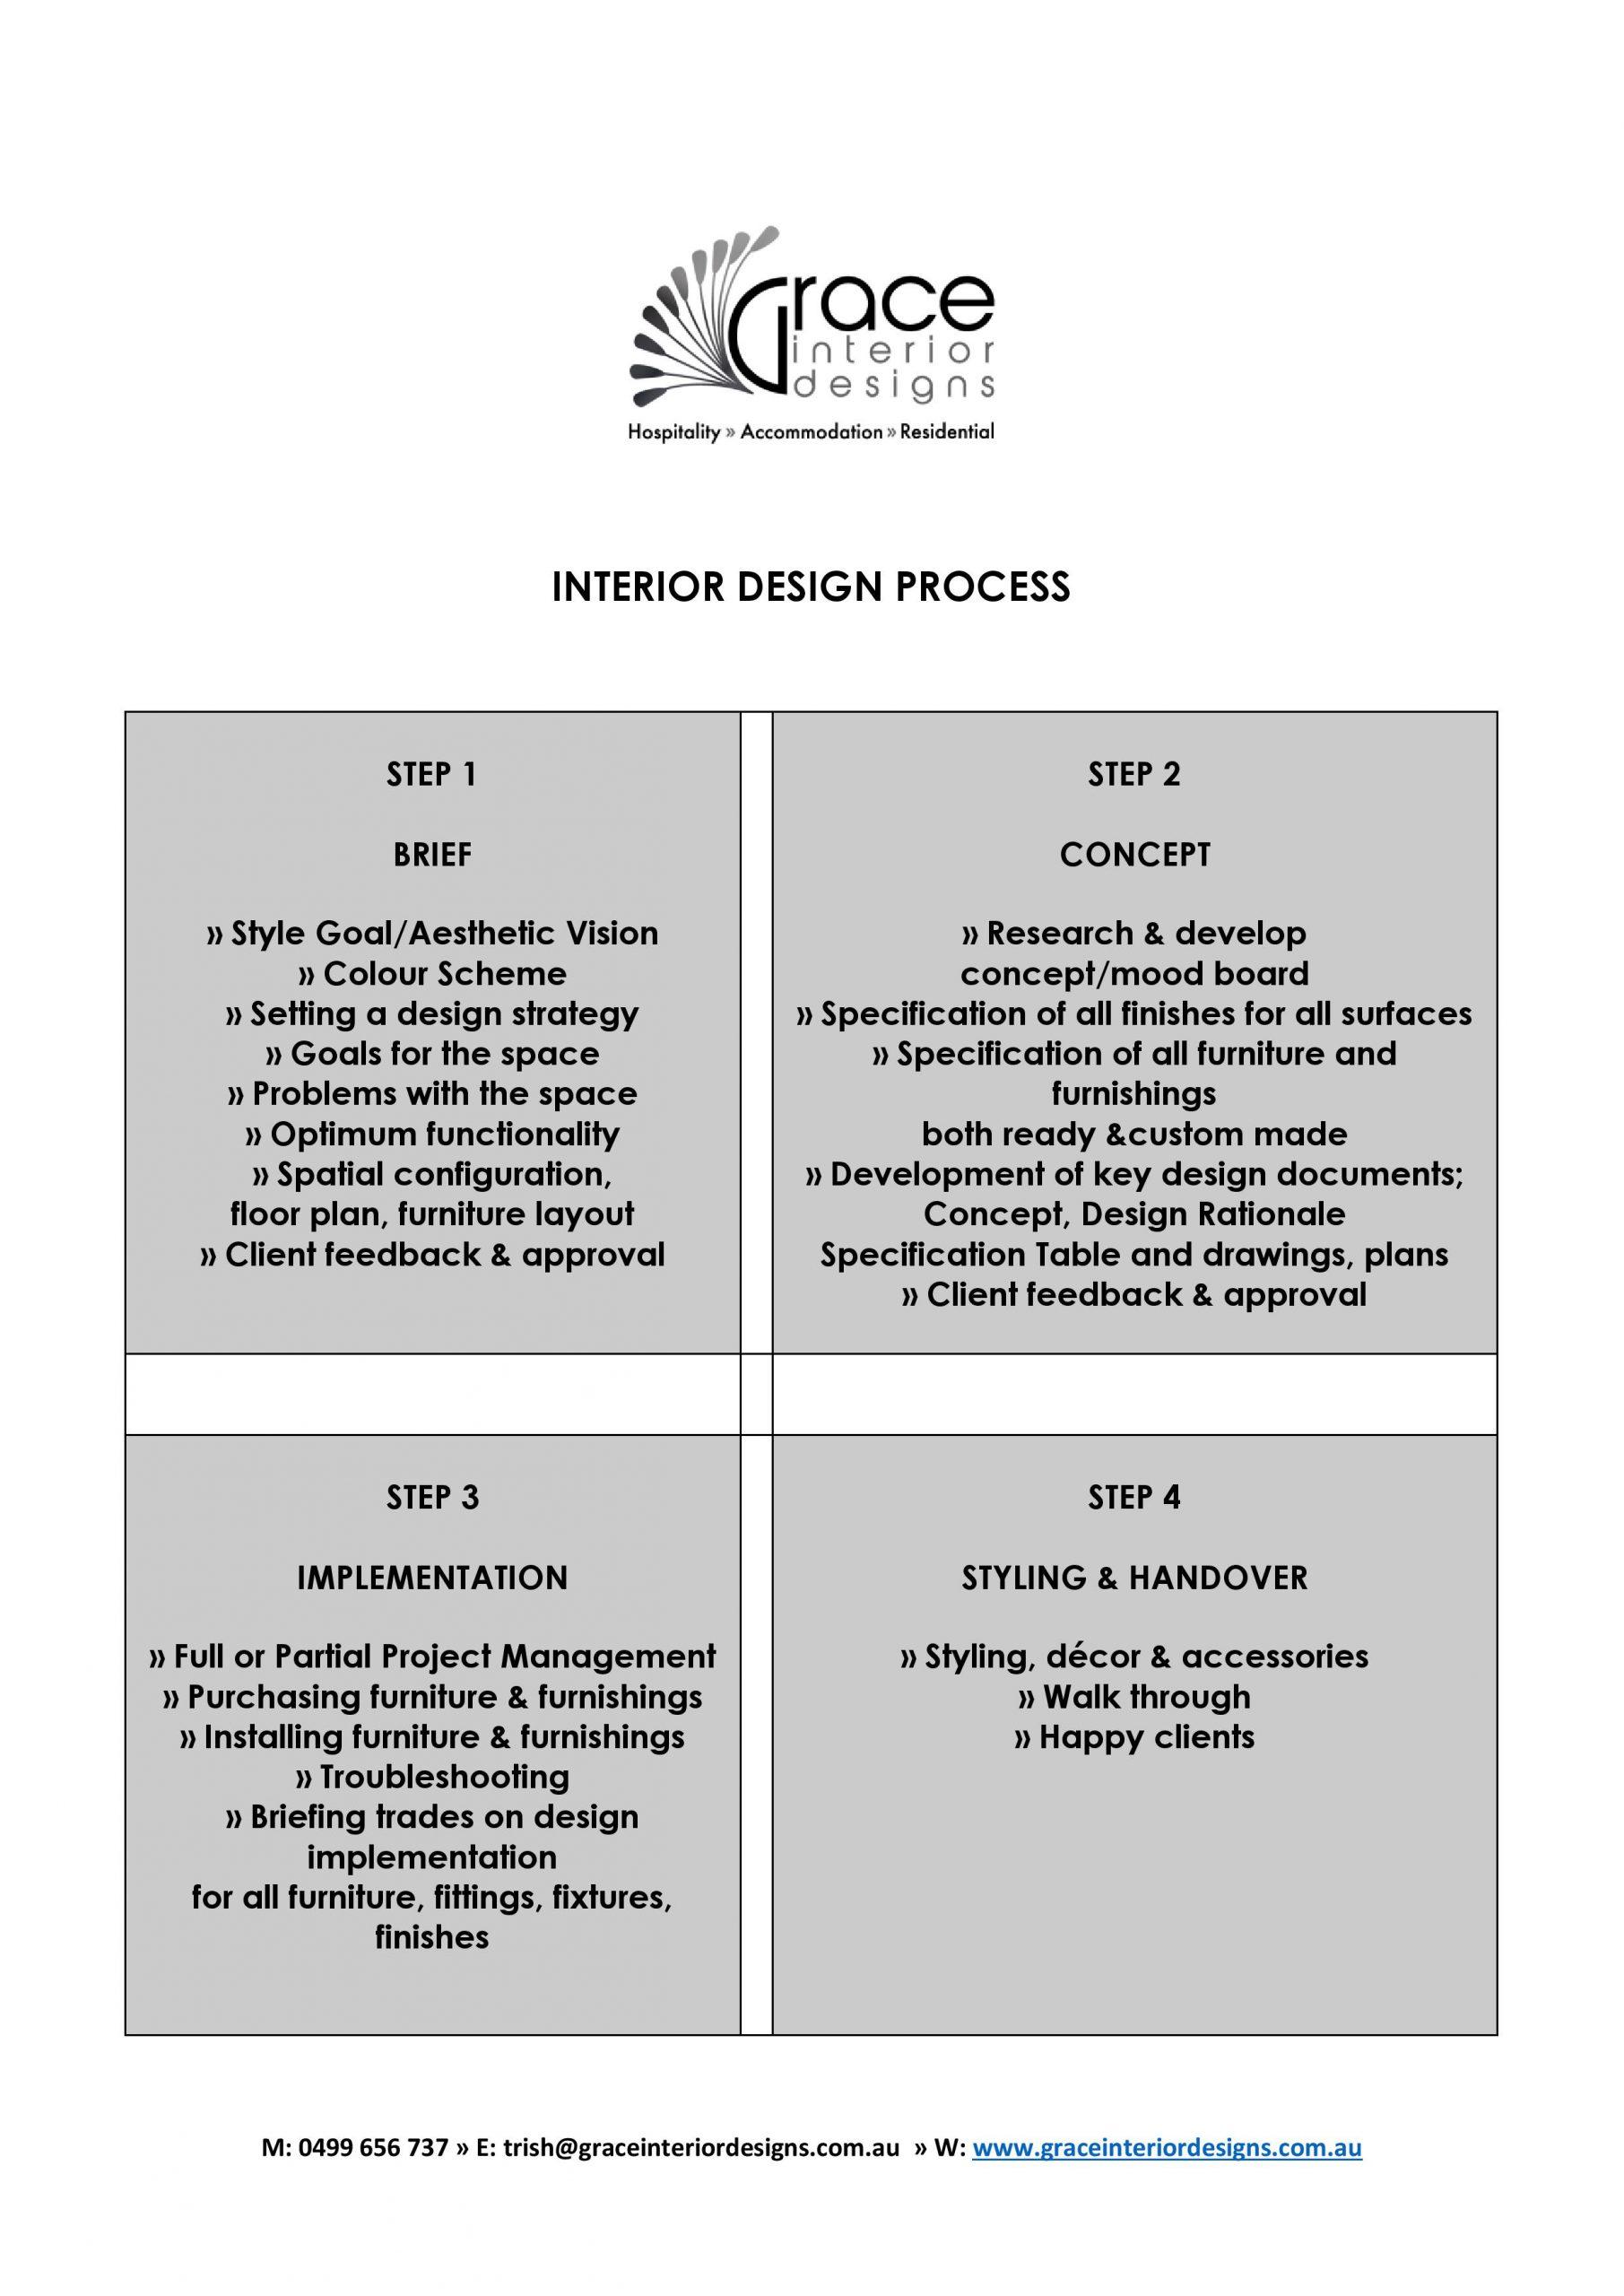 The Heart of Interior Design – the Brief